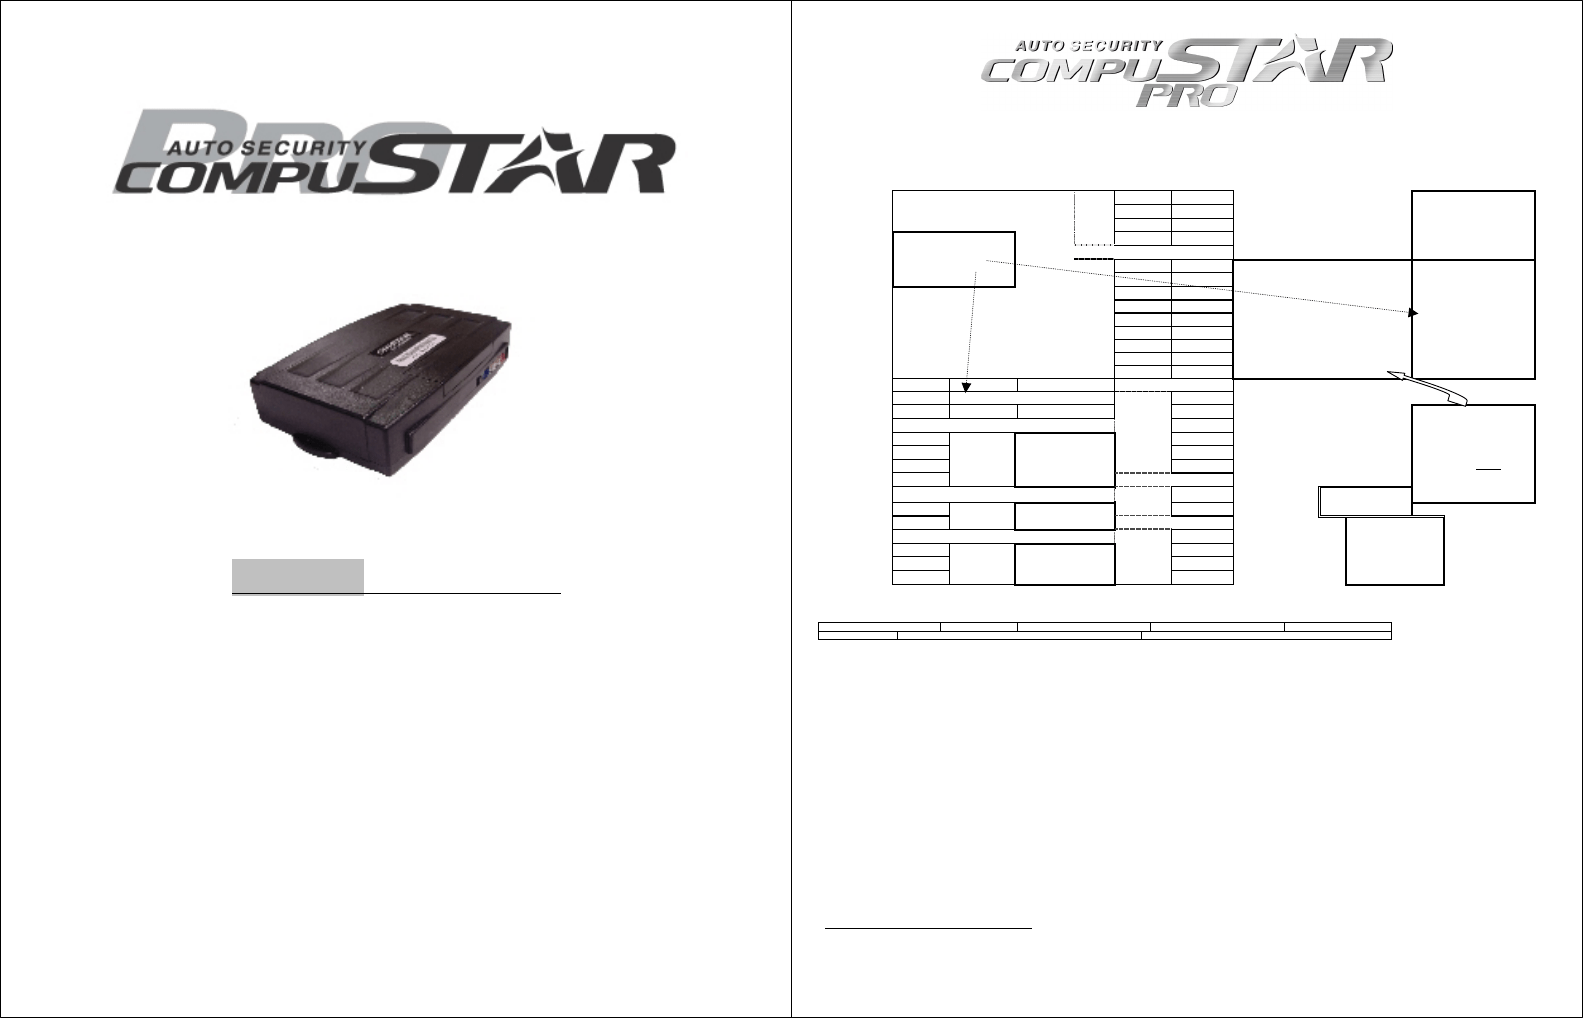 Compustar Cm Wiring Diagram